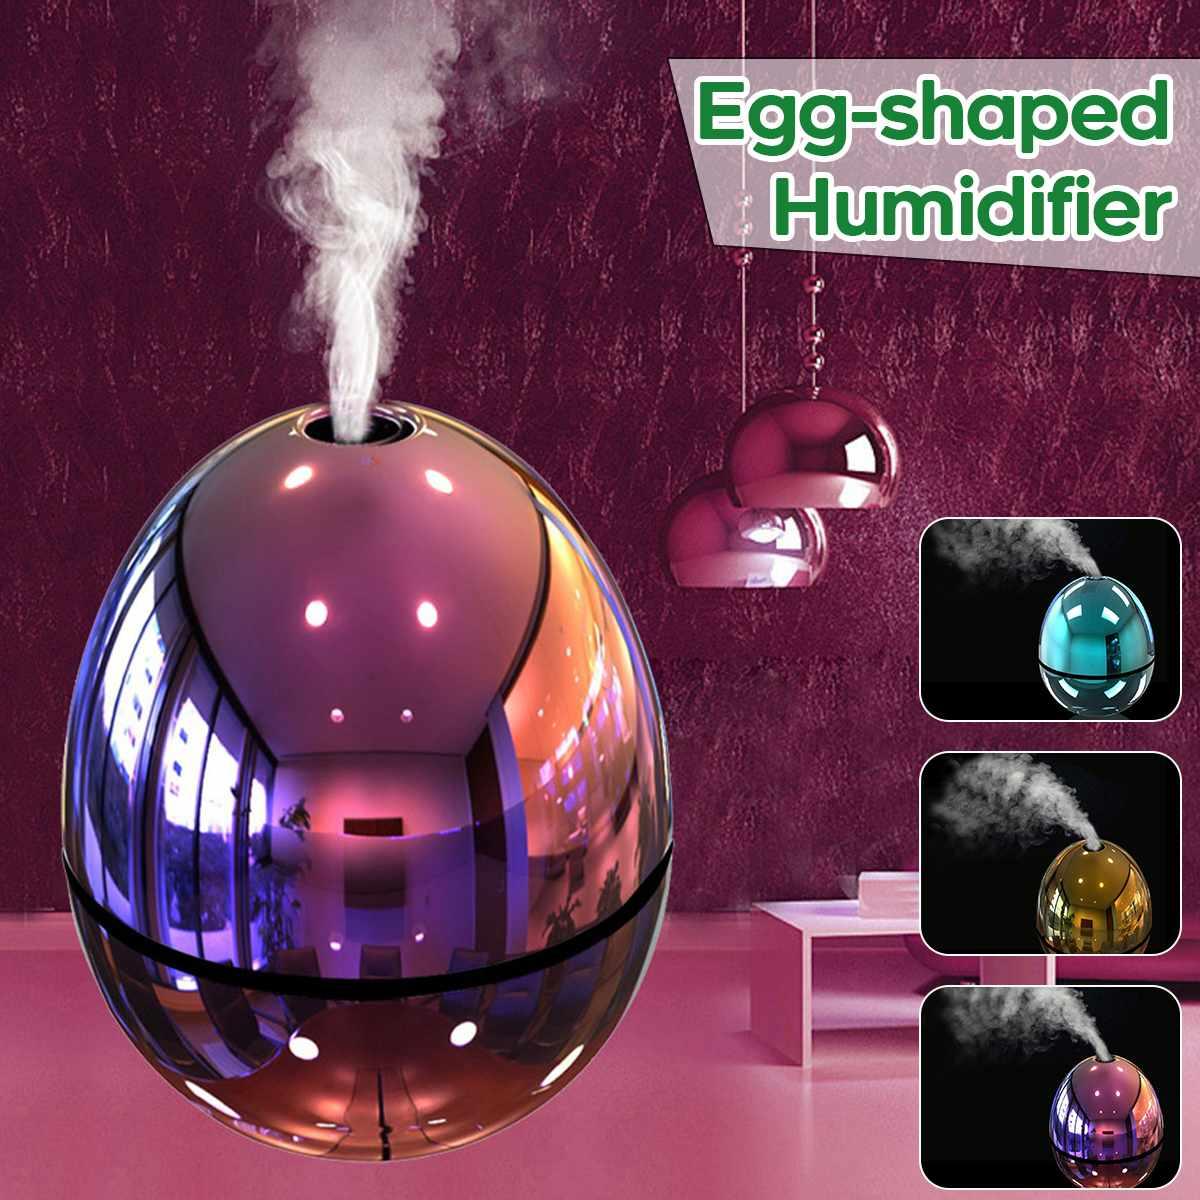 New Air Humidifier USB Electric Portable Egg Shape Humidifier Mini Mist LED Atomizer Air Purifier Diffuser For Home Car Fogger